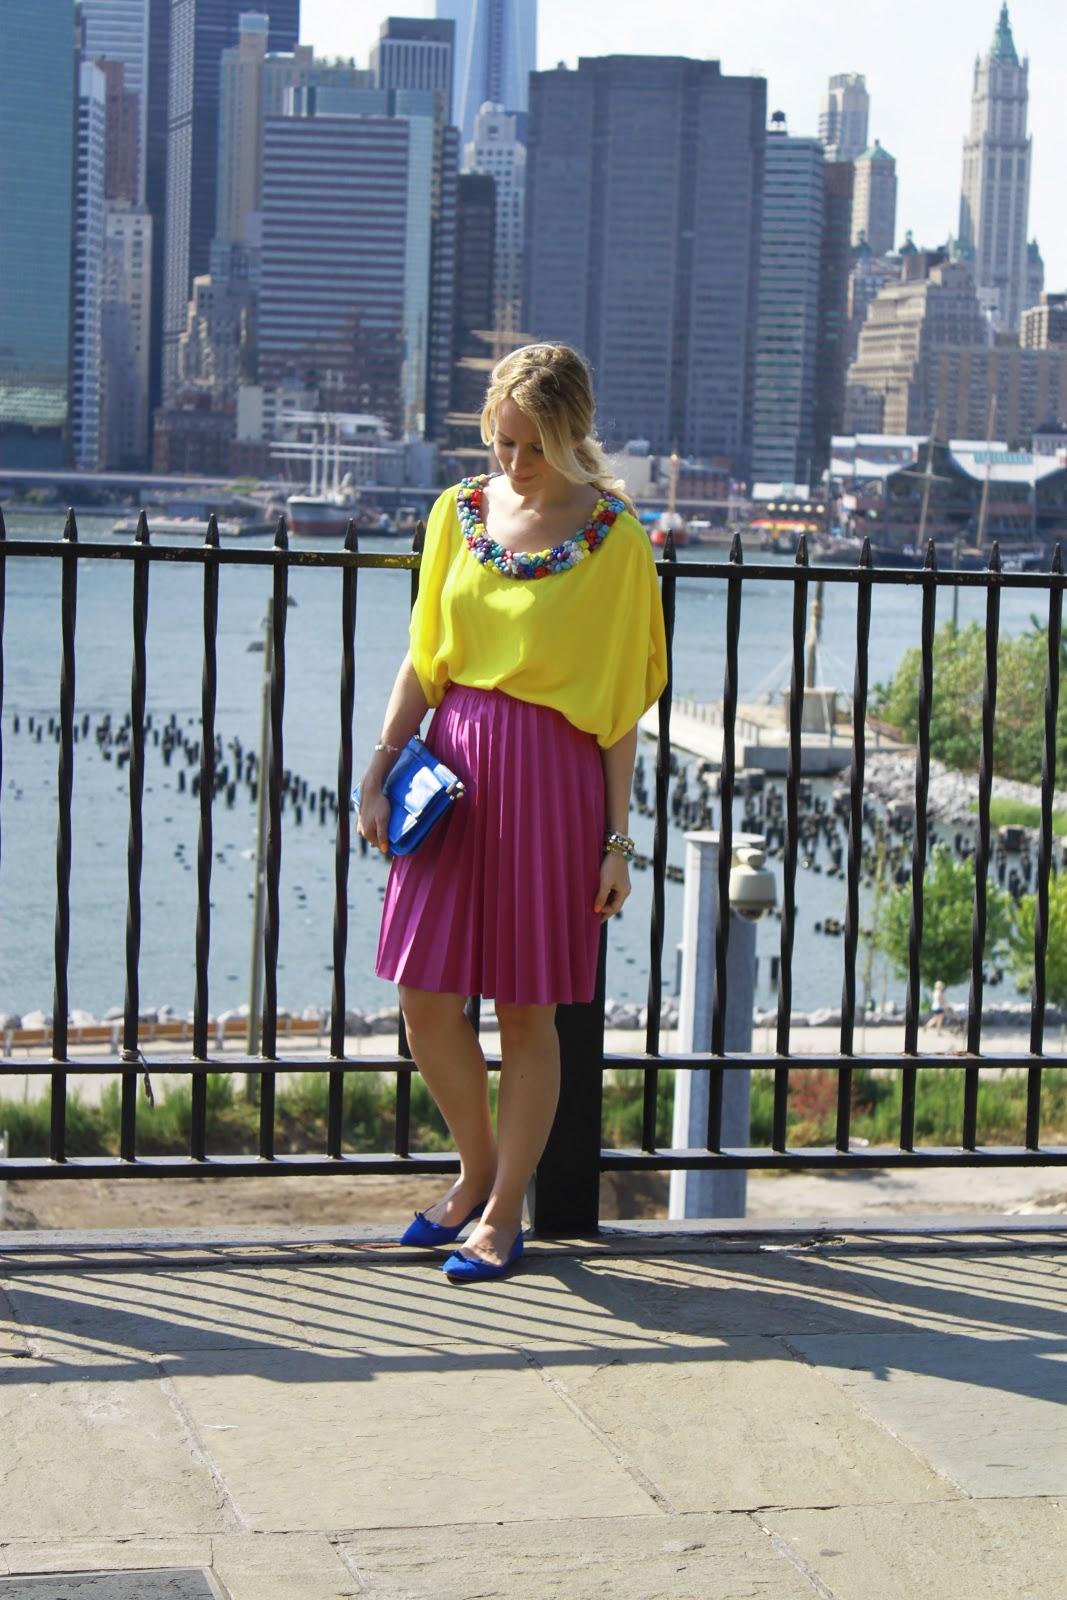 pink_yellow_blue.